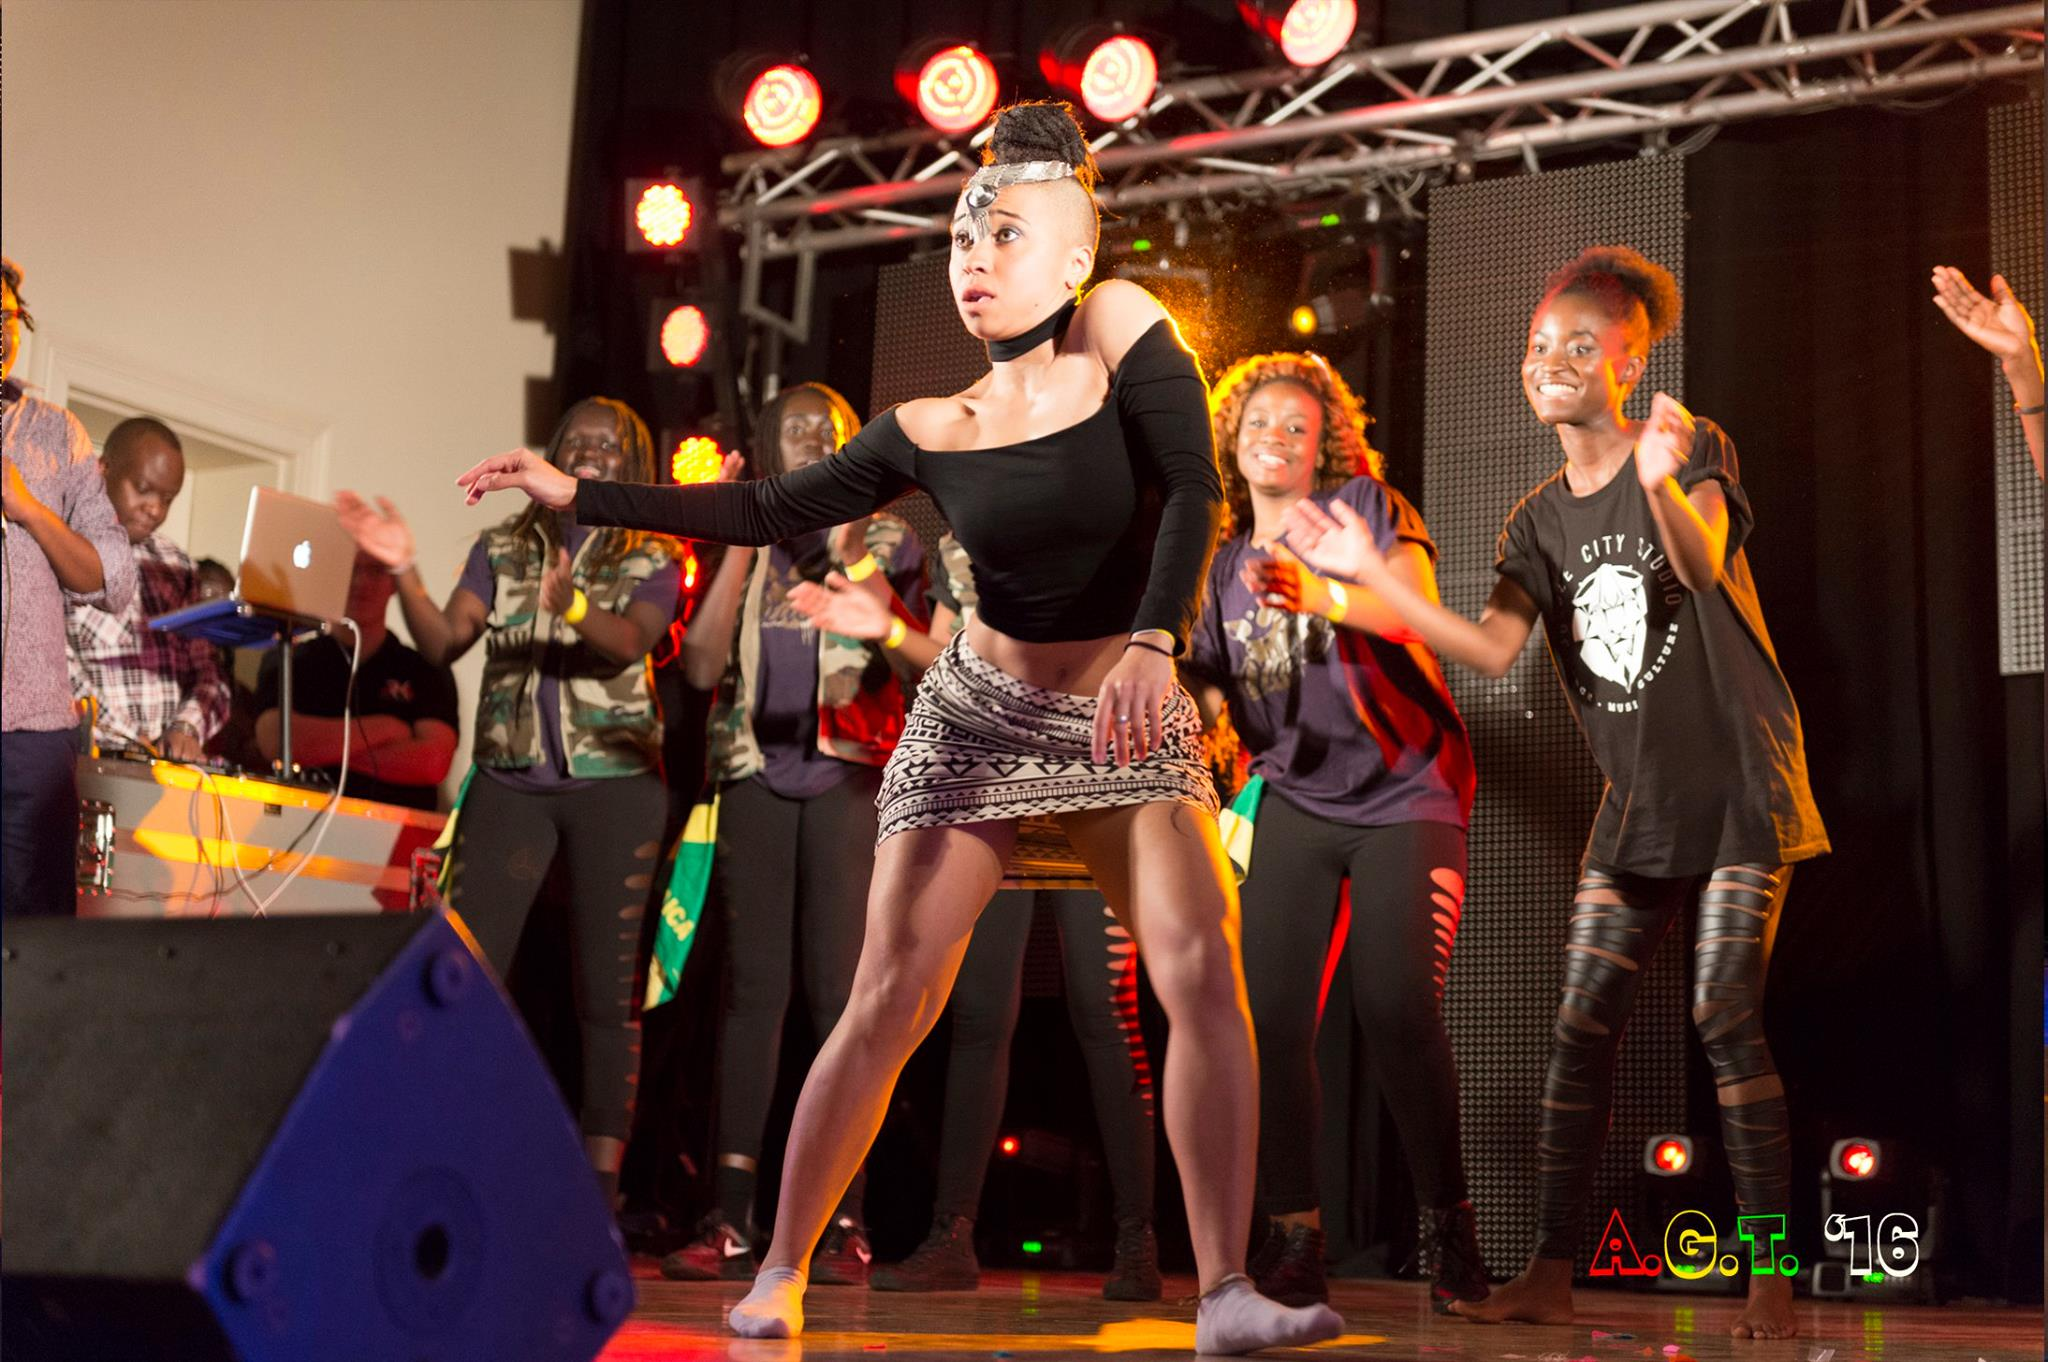 Africa's Got Talent Judge Showcase 2016 - Melbourne, AUS